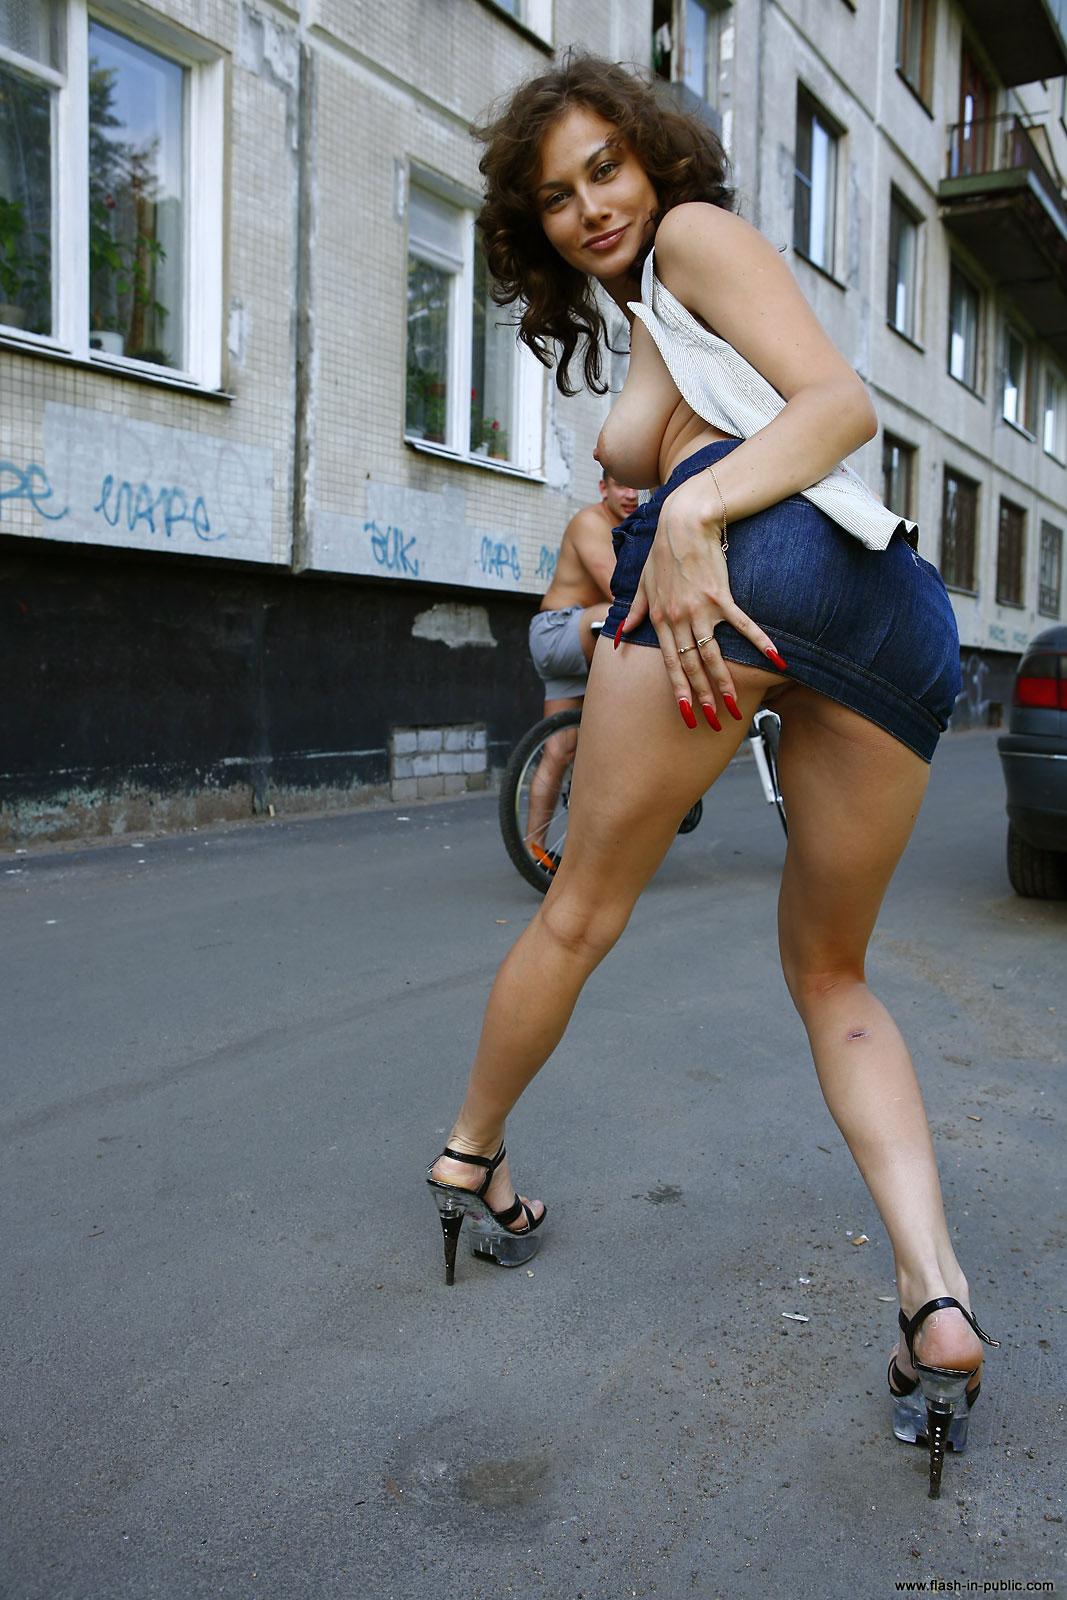 marianna-h-nude-park-flash-in-public-34